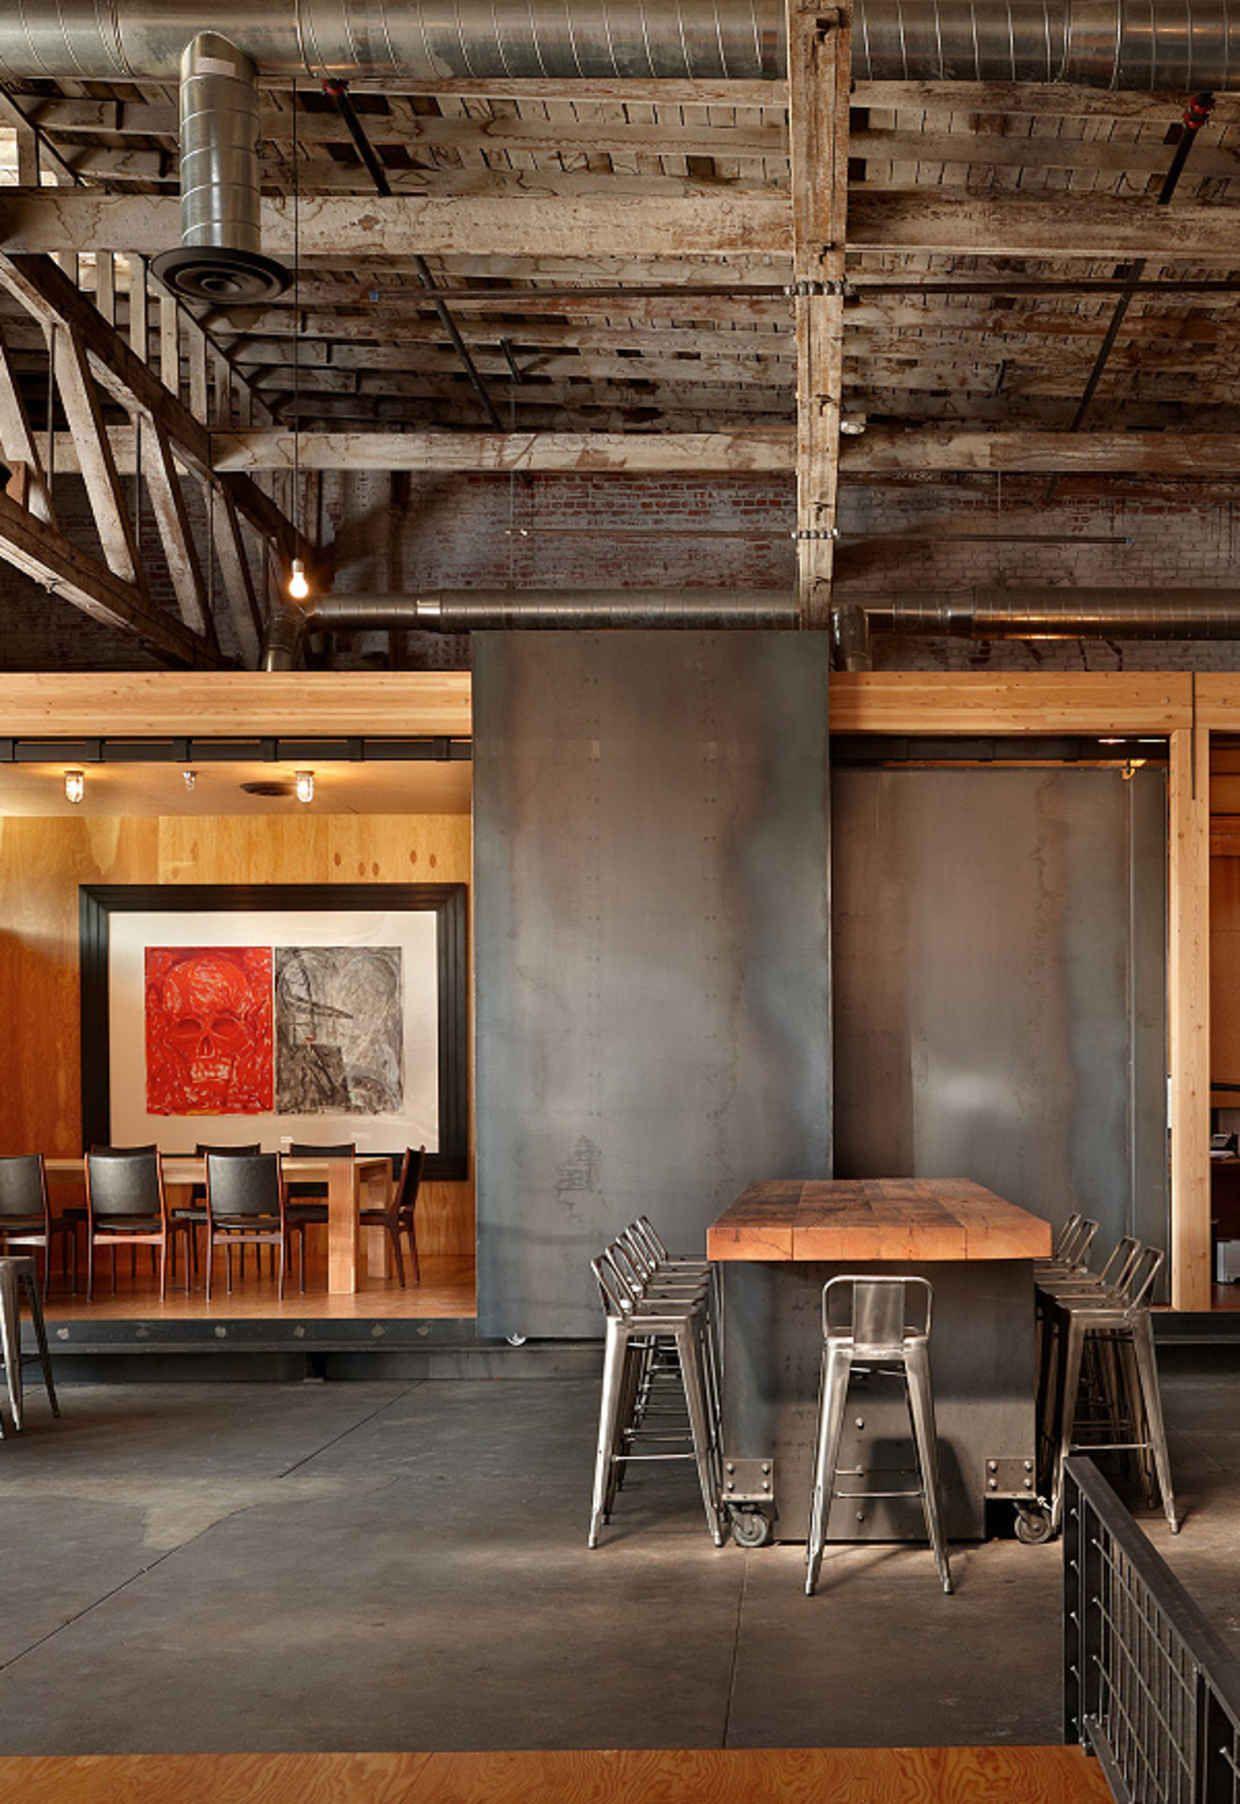 50 Flawless Examples Of Industrial Inspired Interior Design Part 4 Industrieel Interieurontwerp Industriele Interieurs Binnenhuisarchitectuur